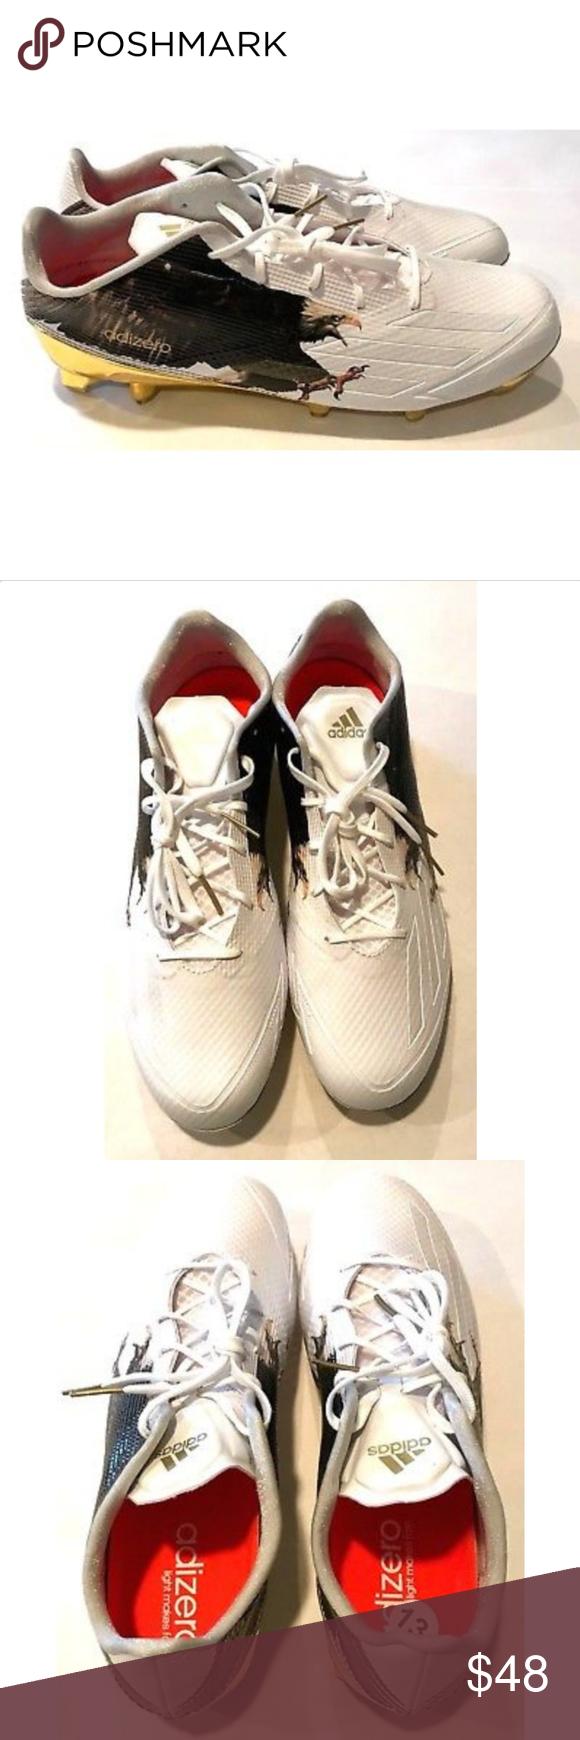 buy popular dfbb7 383ce Adidas Adizero 5-Star 5.0 Uncaged Football Cleat Adidas Adizero 5-Star 5.0  Uncaged